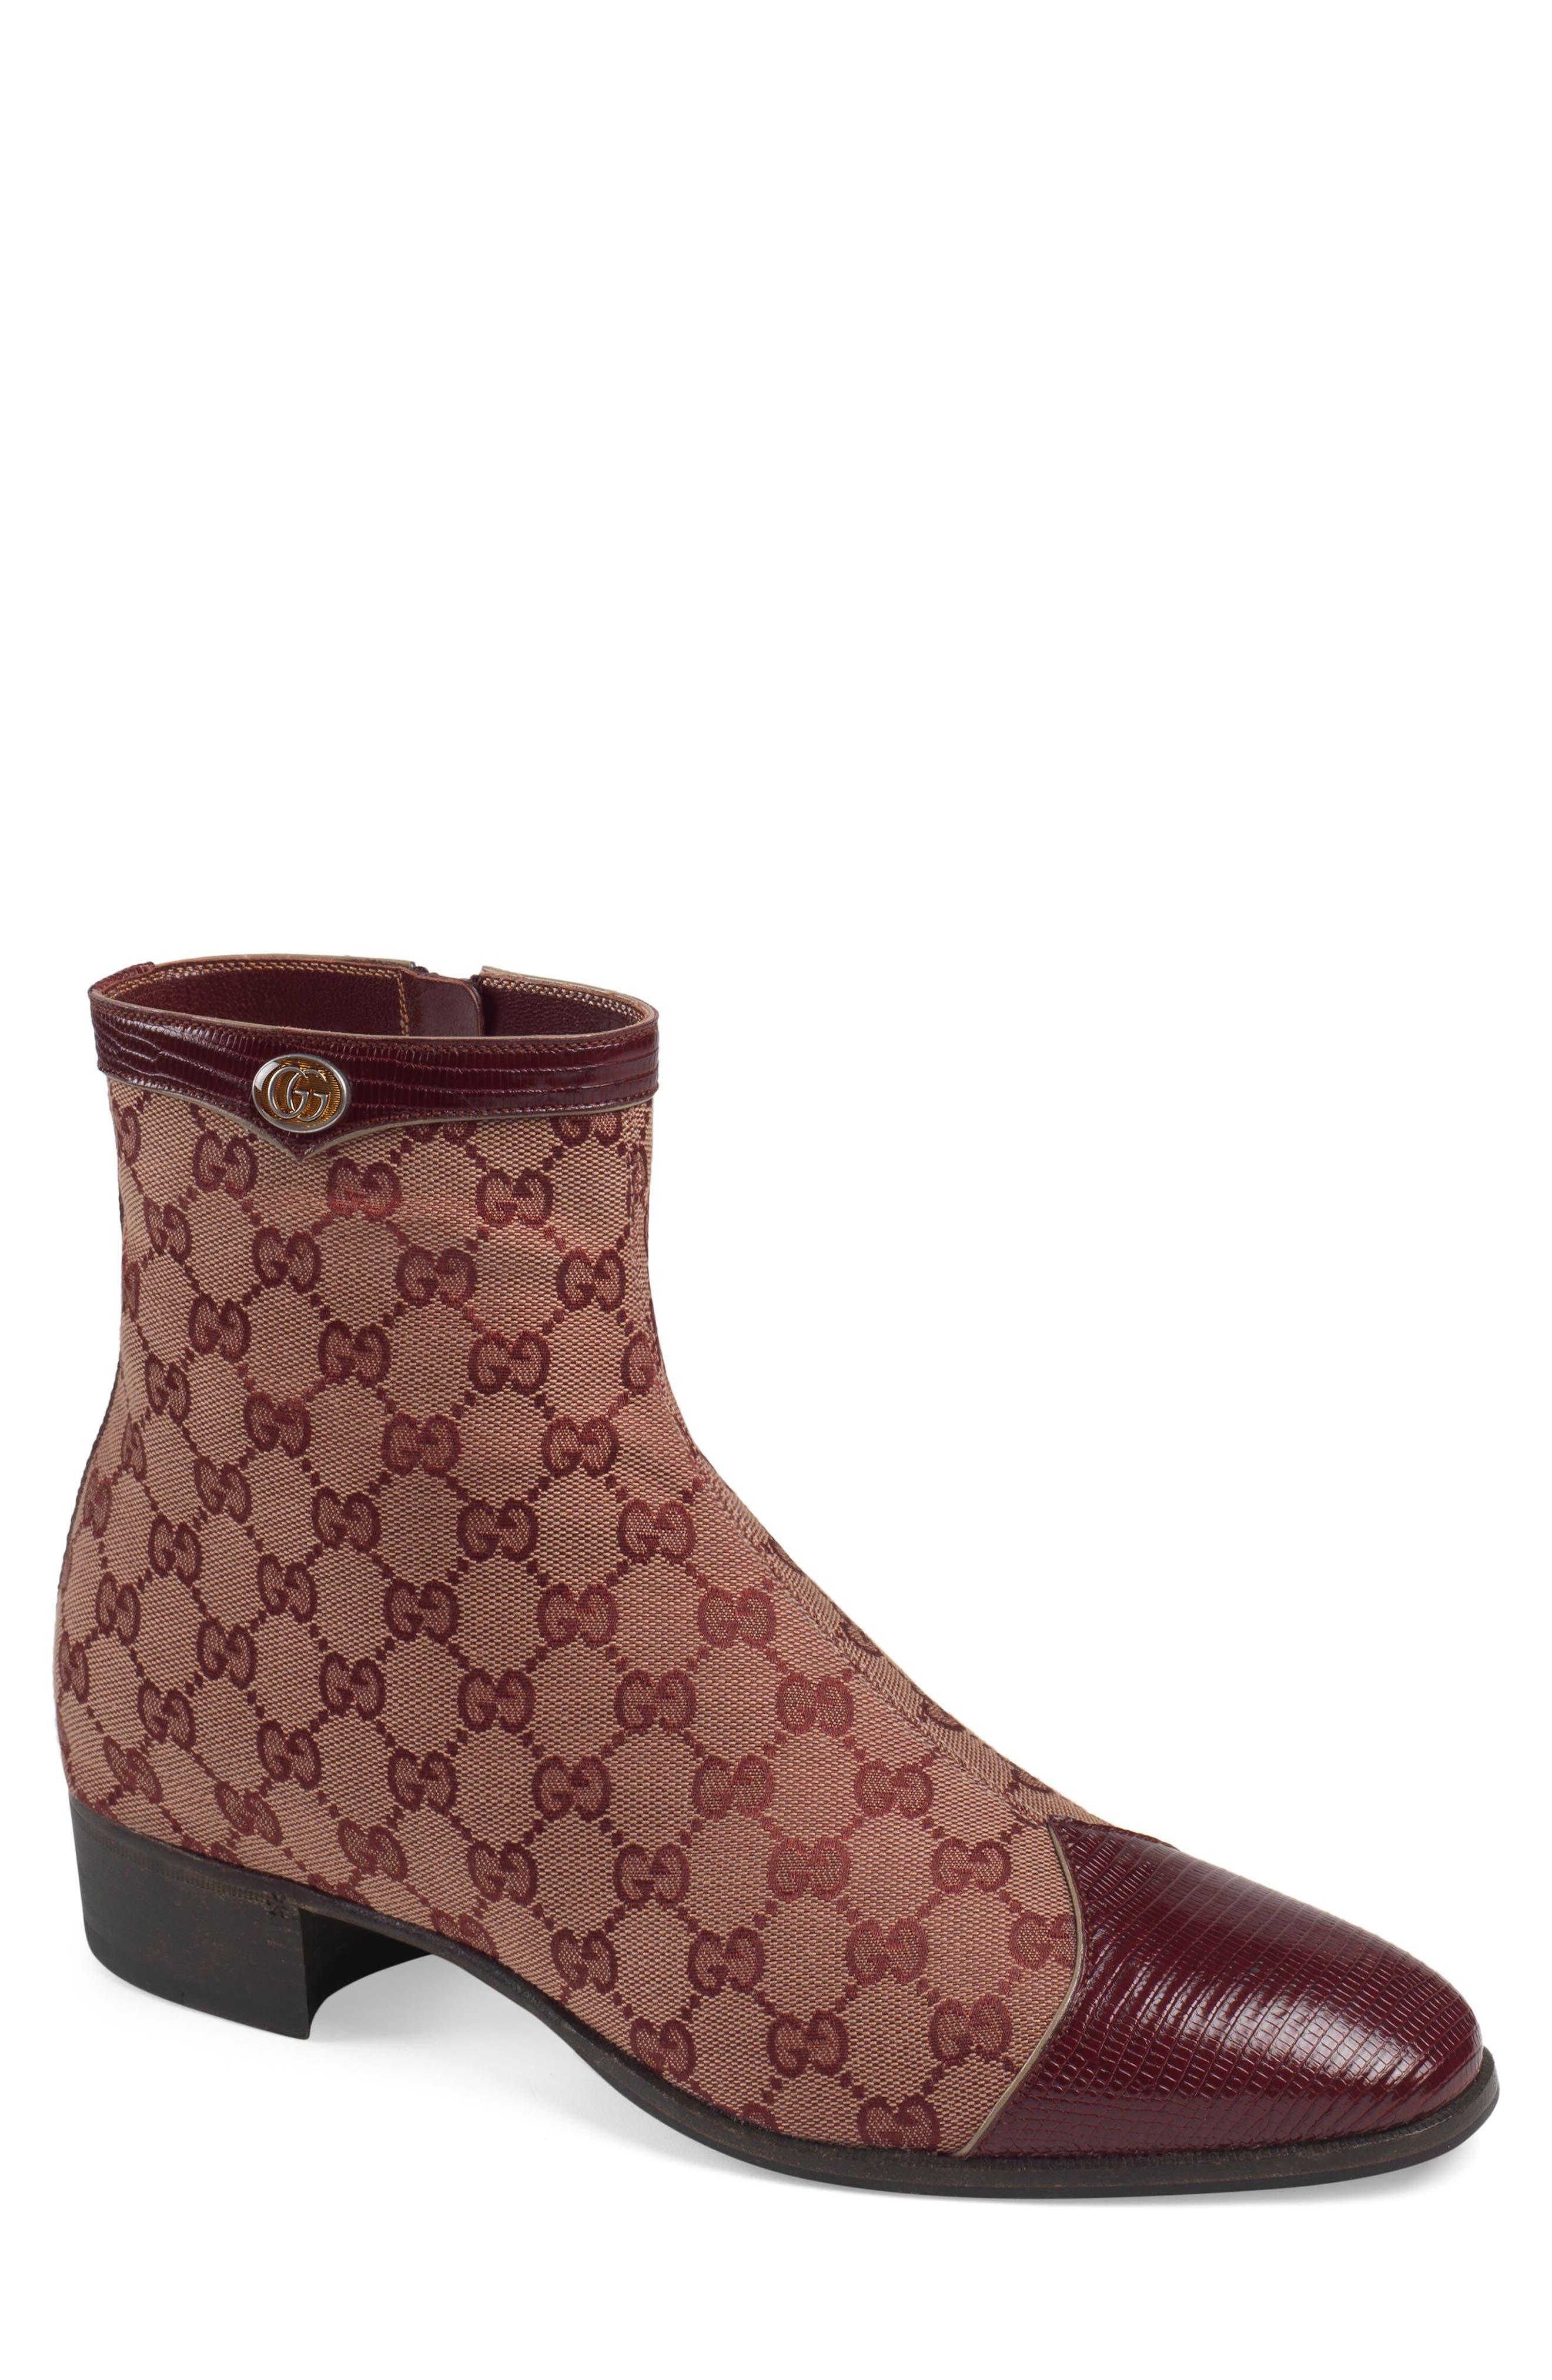 Gucci Plata Zip BootUS / 8.5UK - Brown